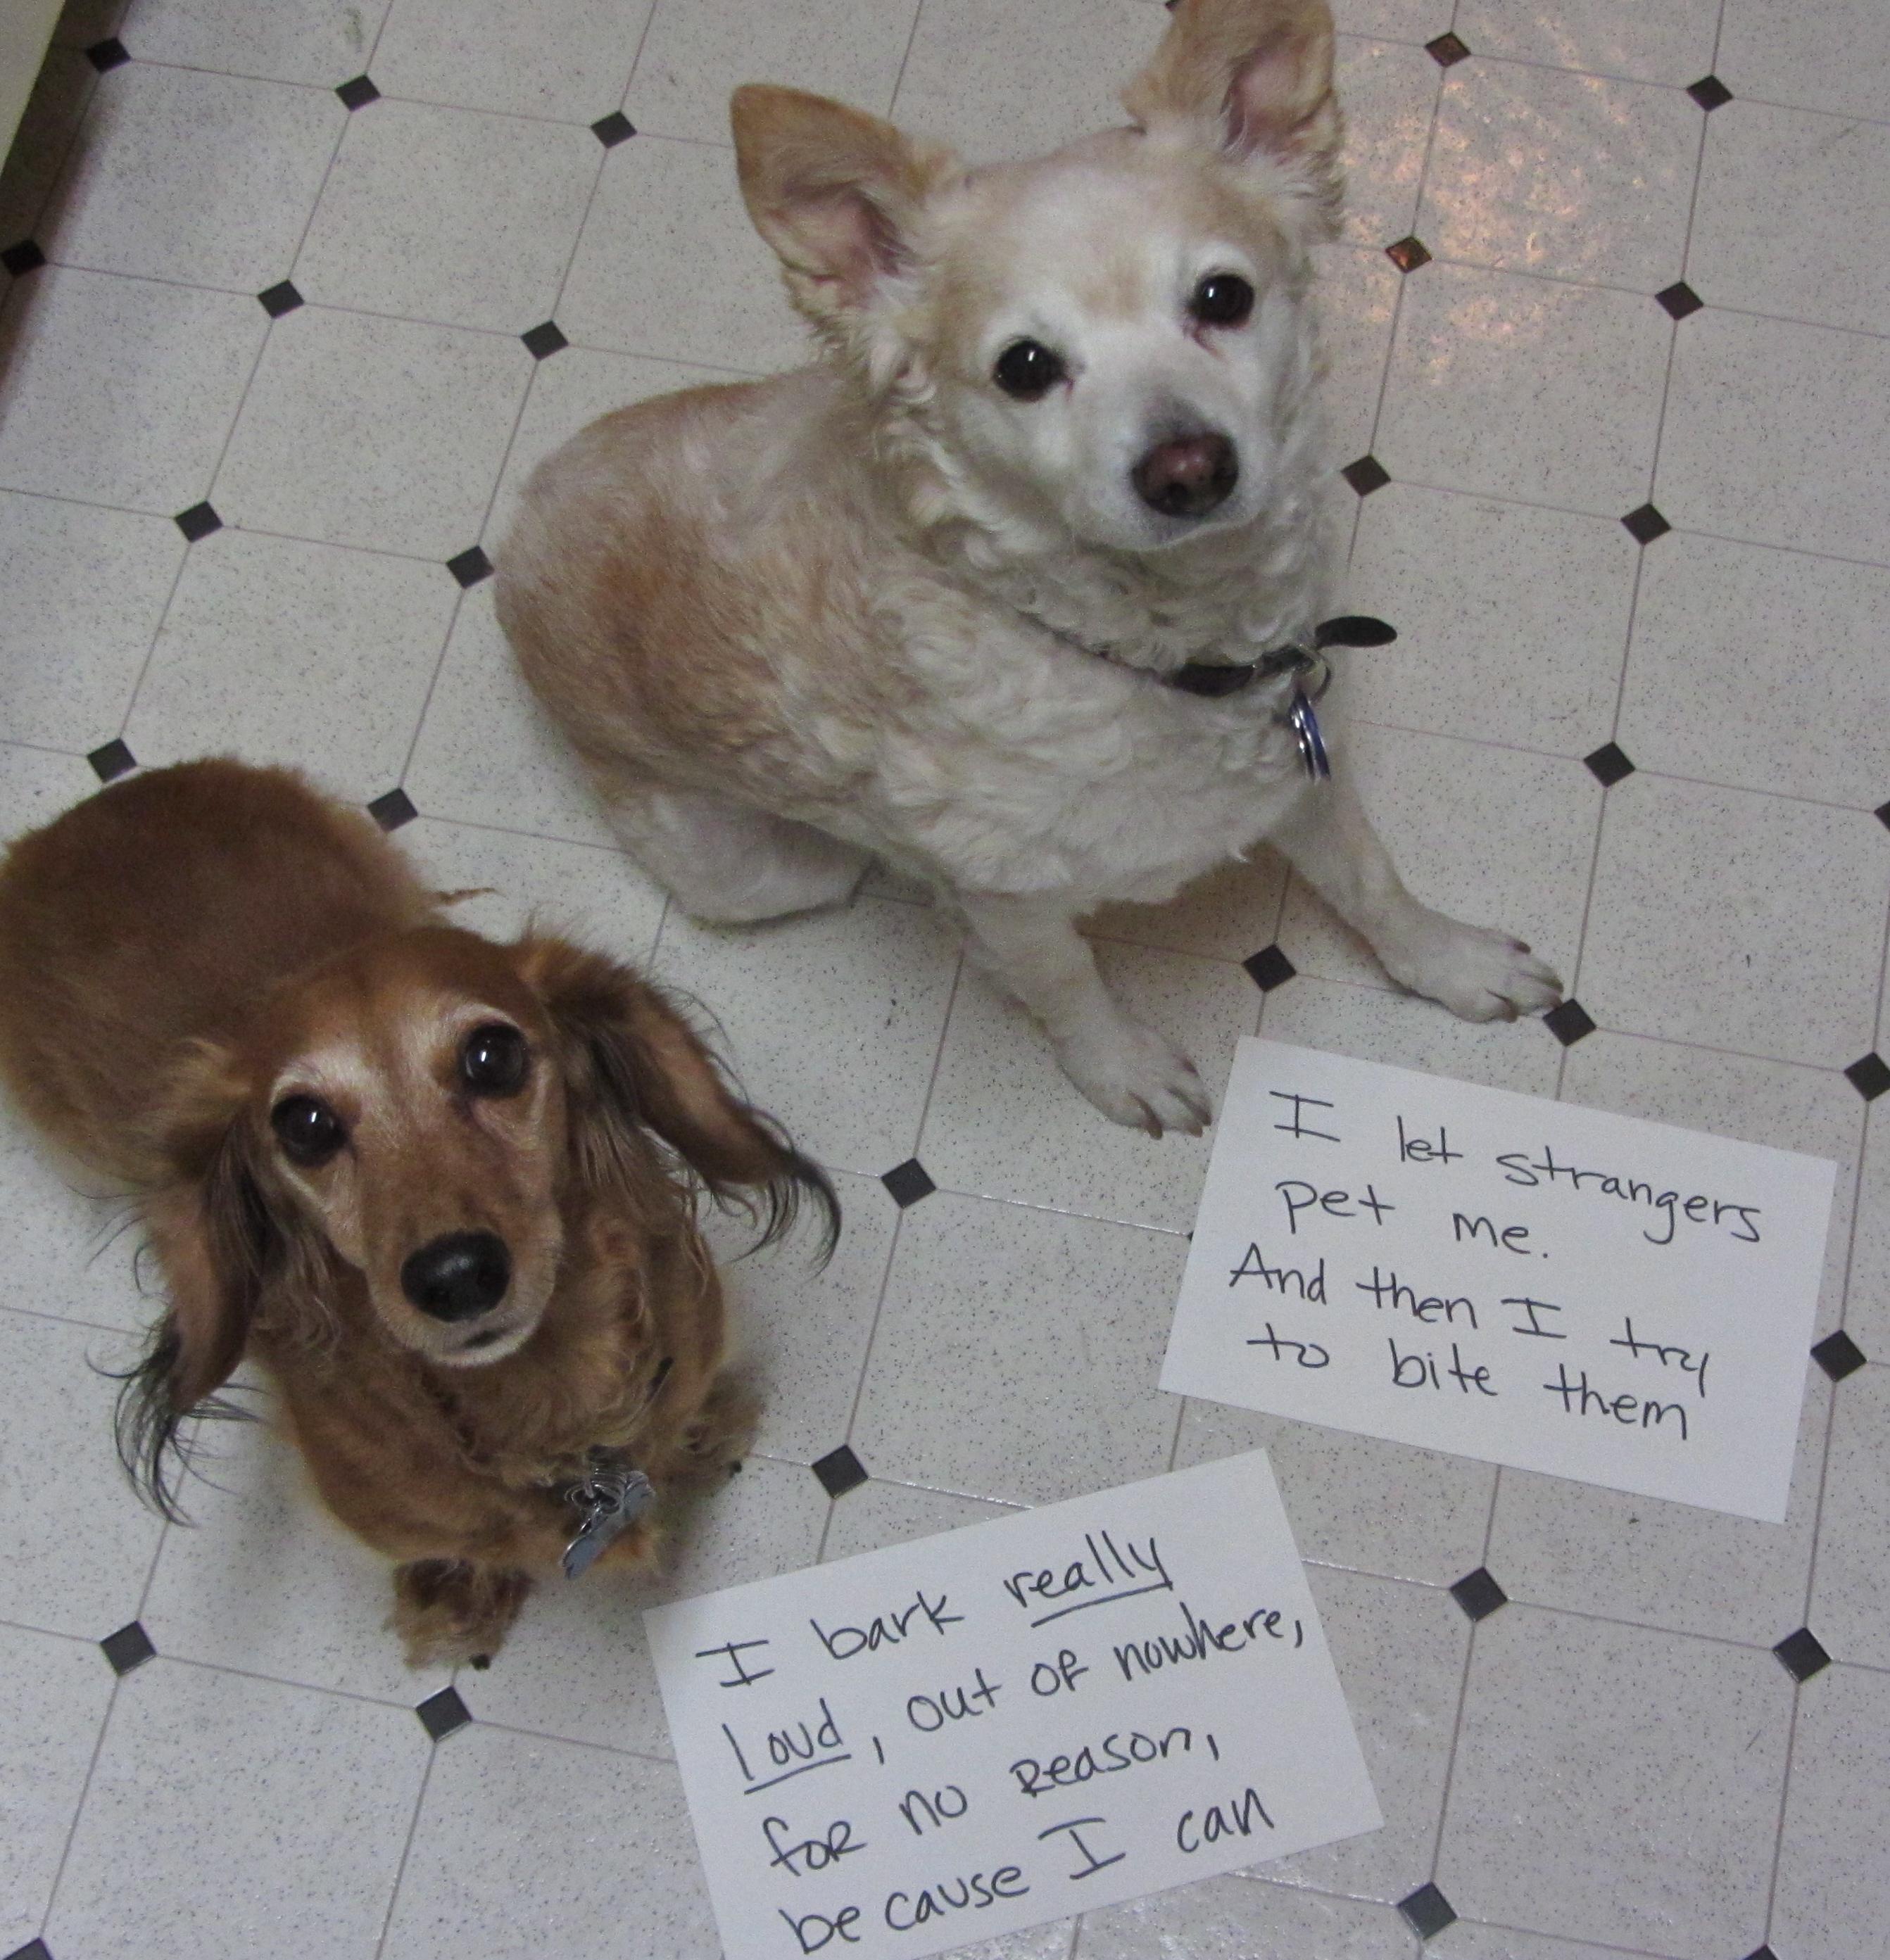 File Dog shamingjpg   Wikipedia the free encyclopedia lhy5UGf5